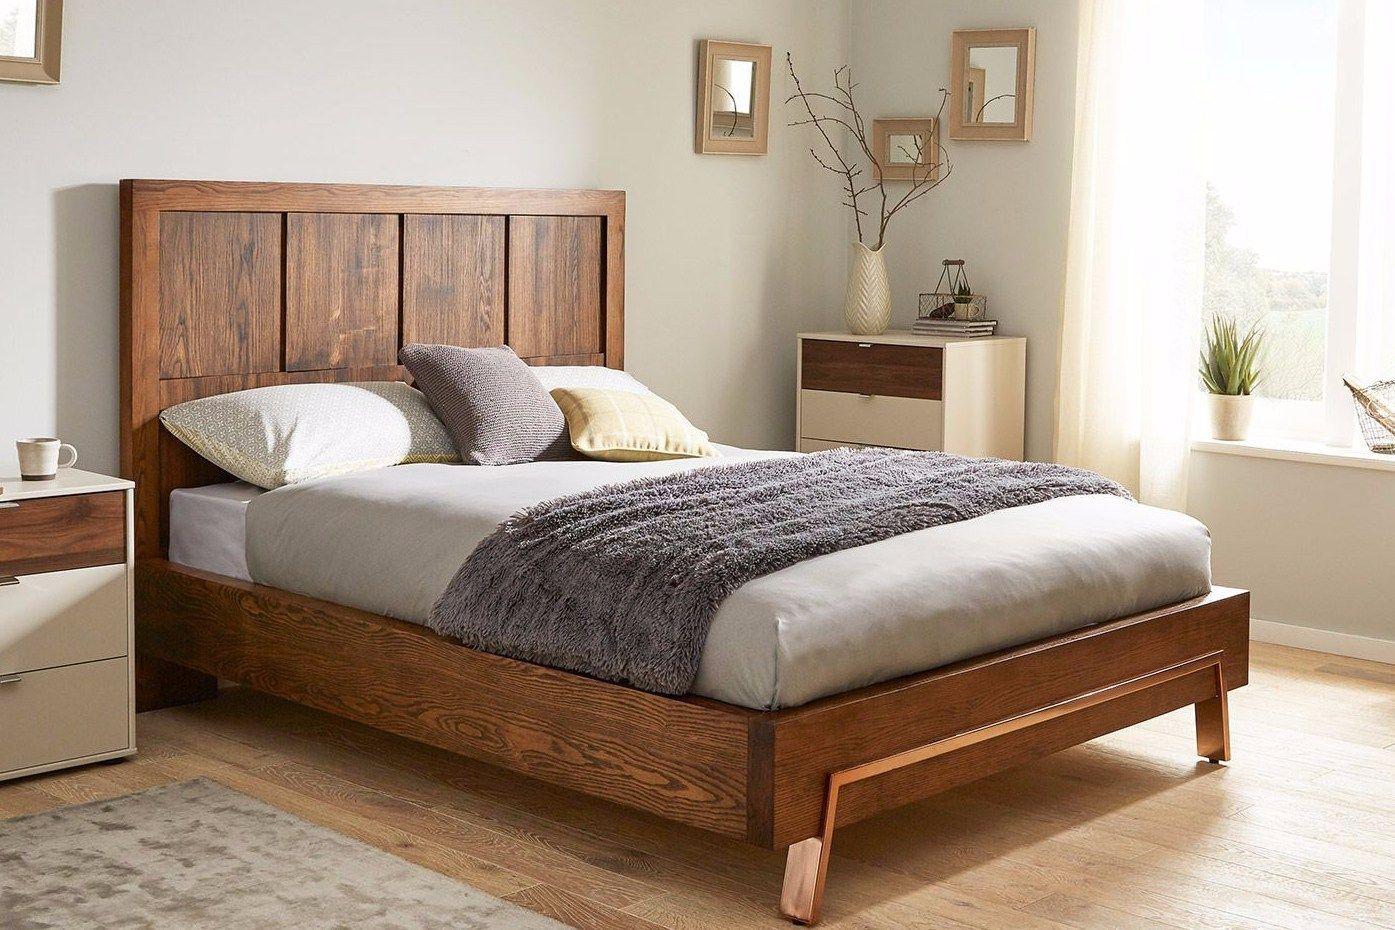 Model Tempat Tidur Kayu Sederhana